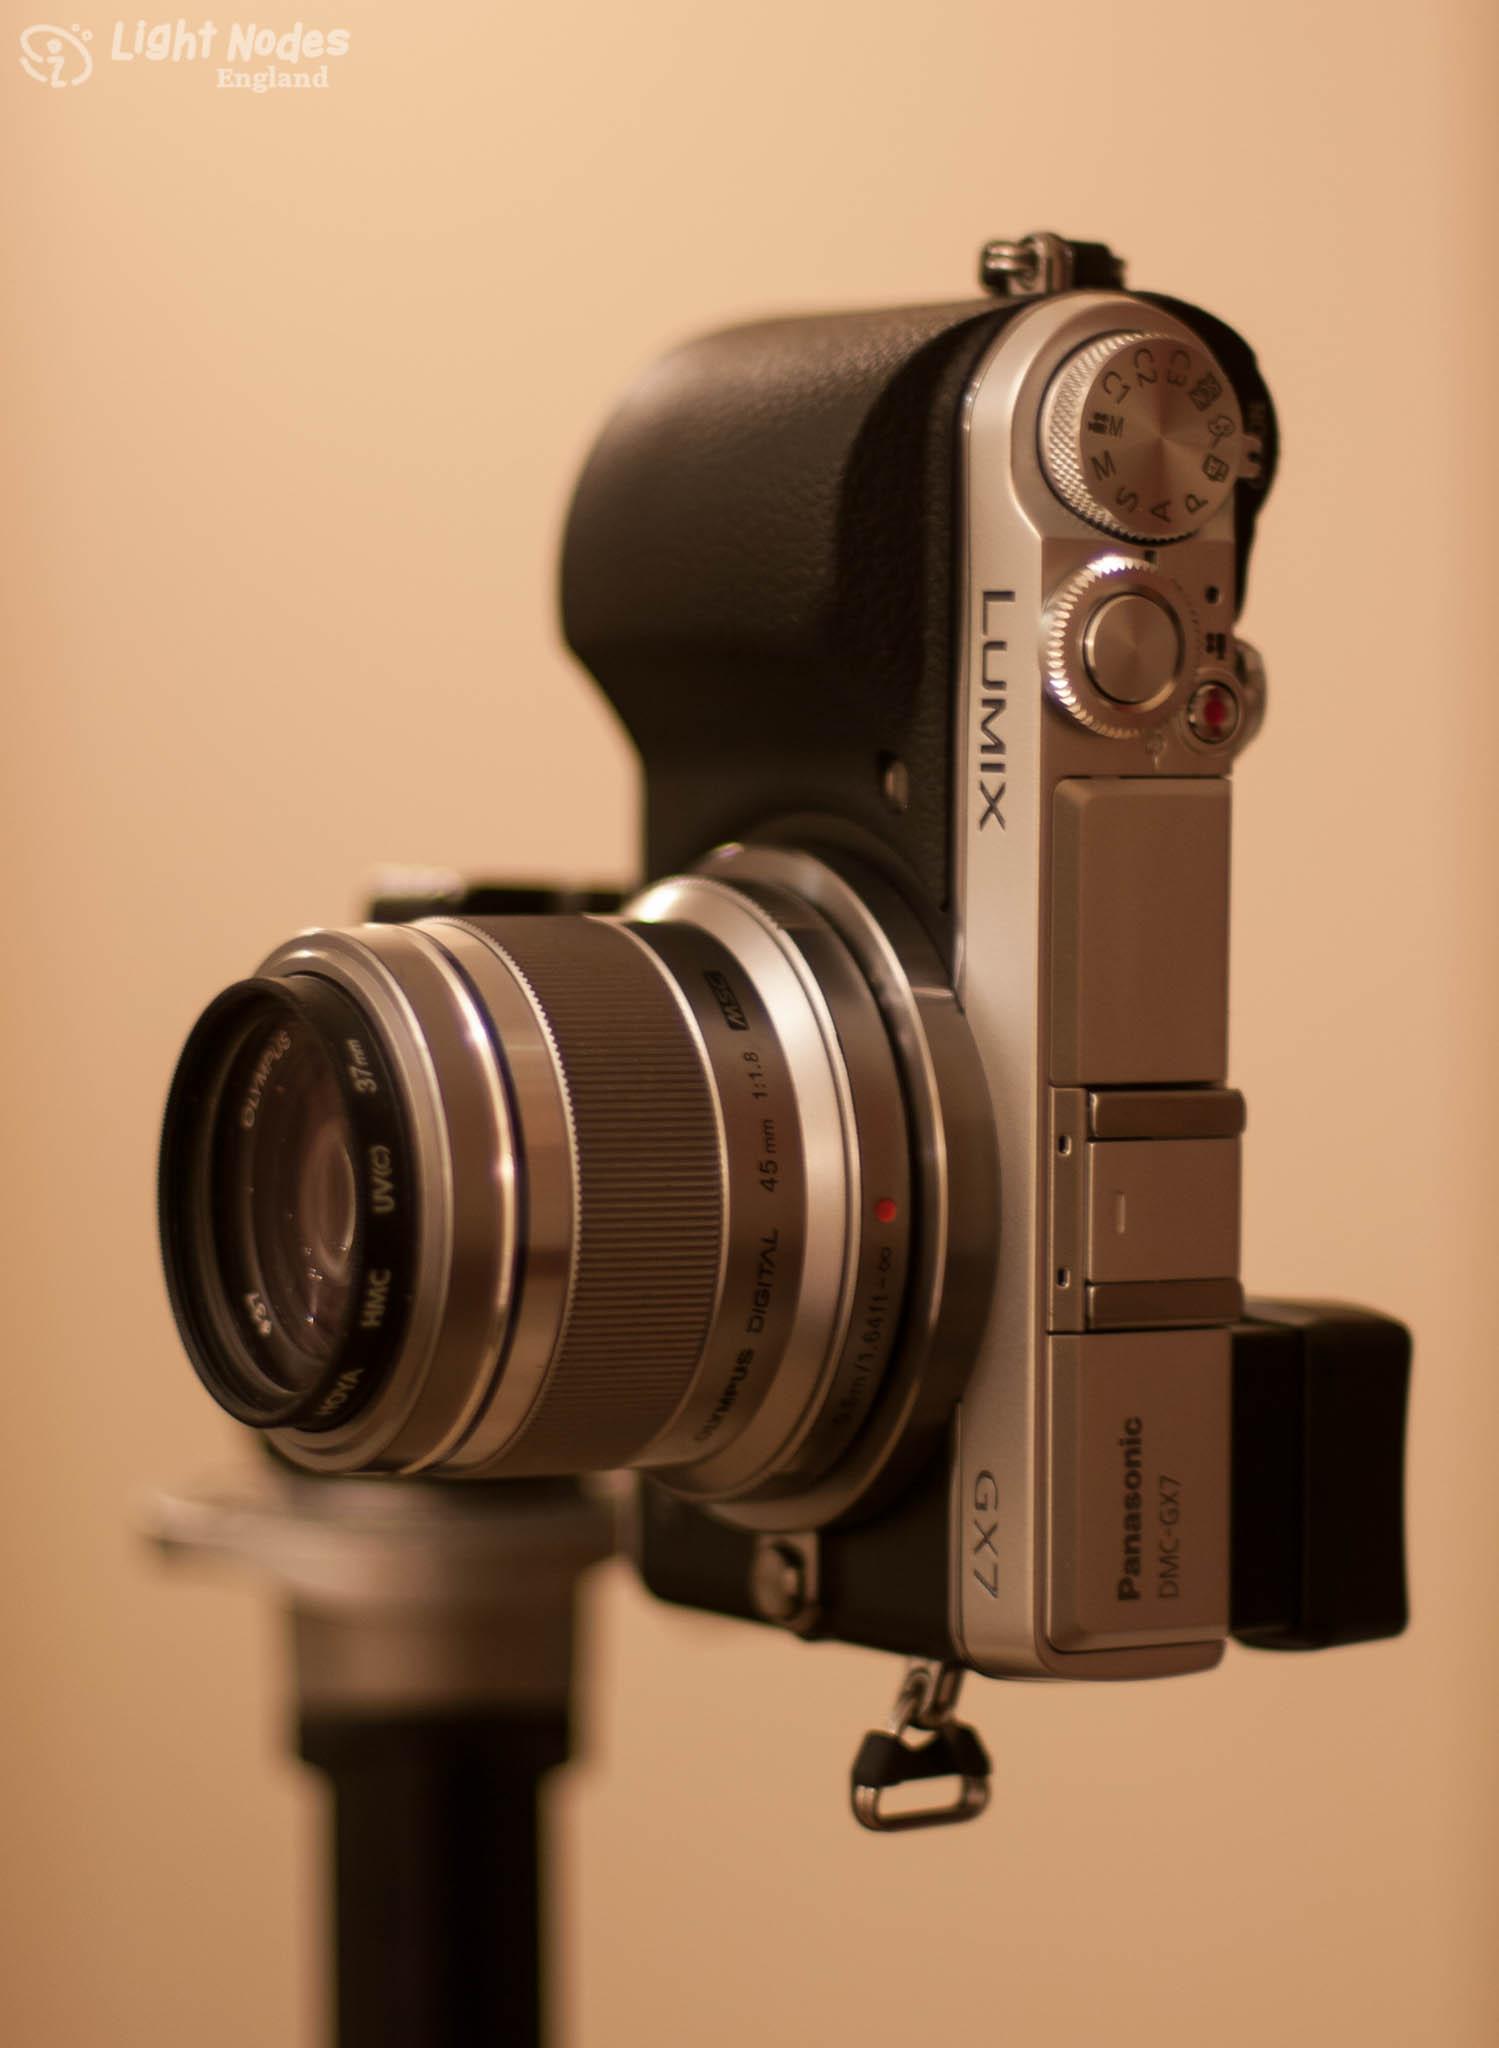 Lumix GX7 with Olympus M.45mm f/1.8 on tripod